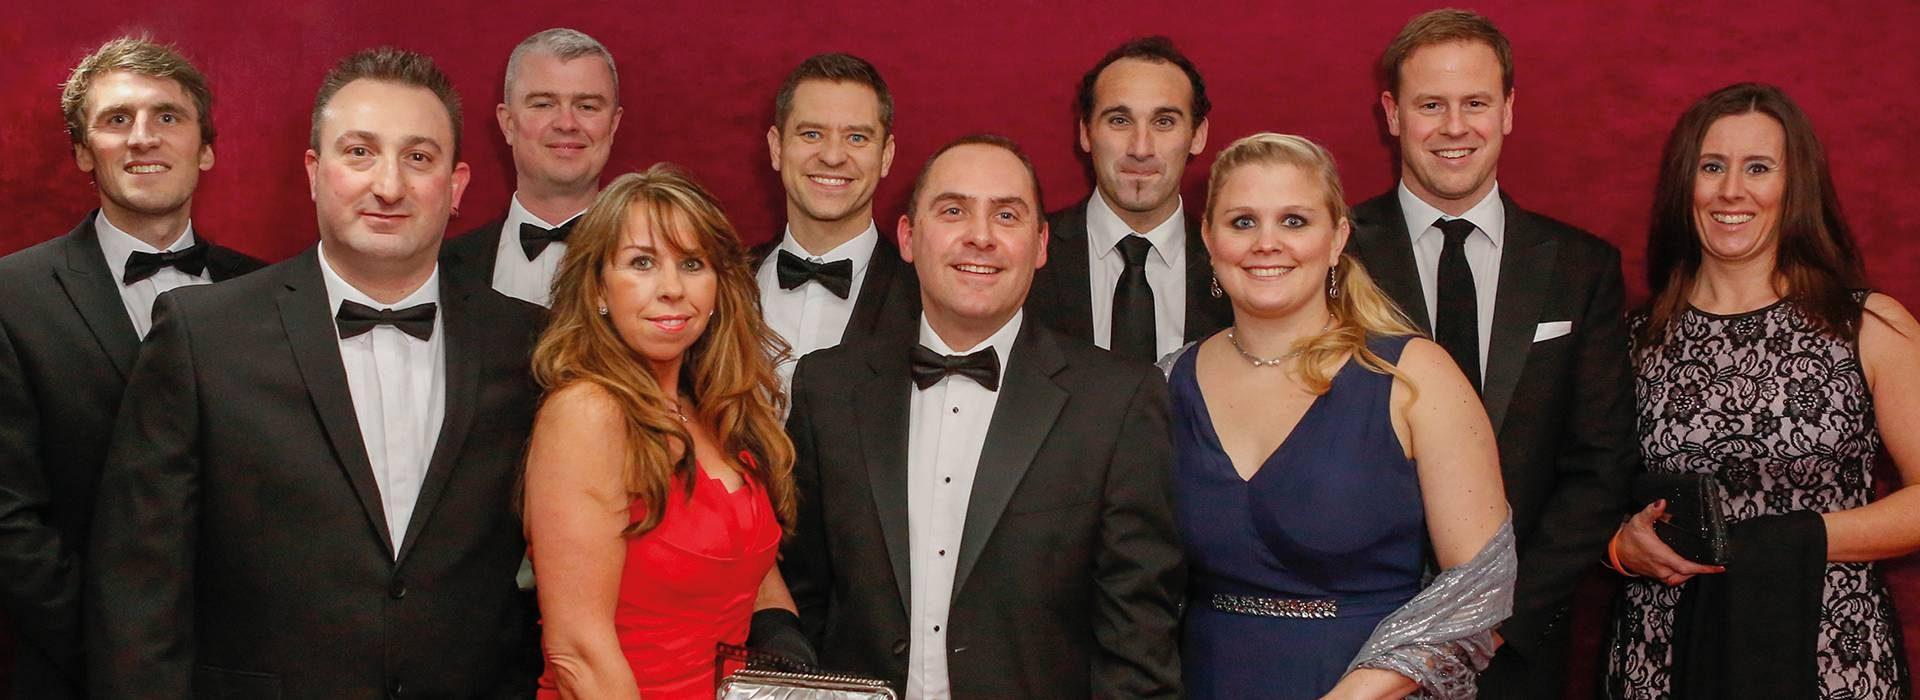 International B2B Marketing Awards win for Lesniak Swann